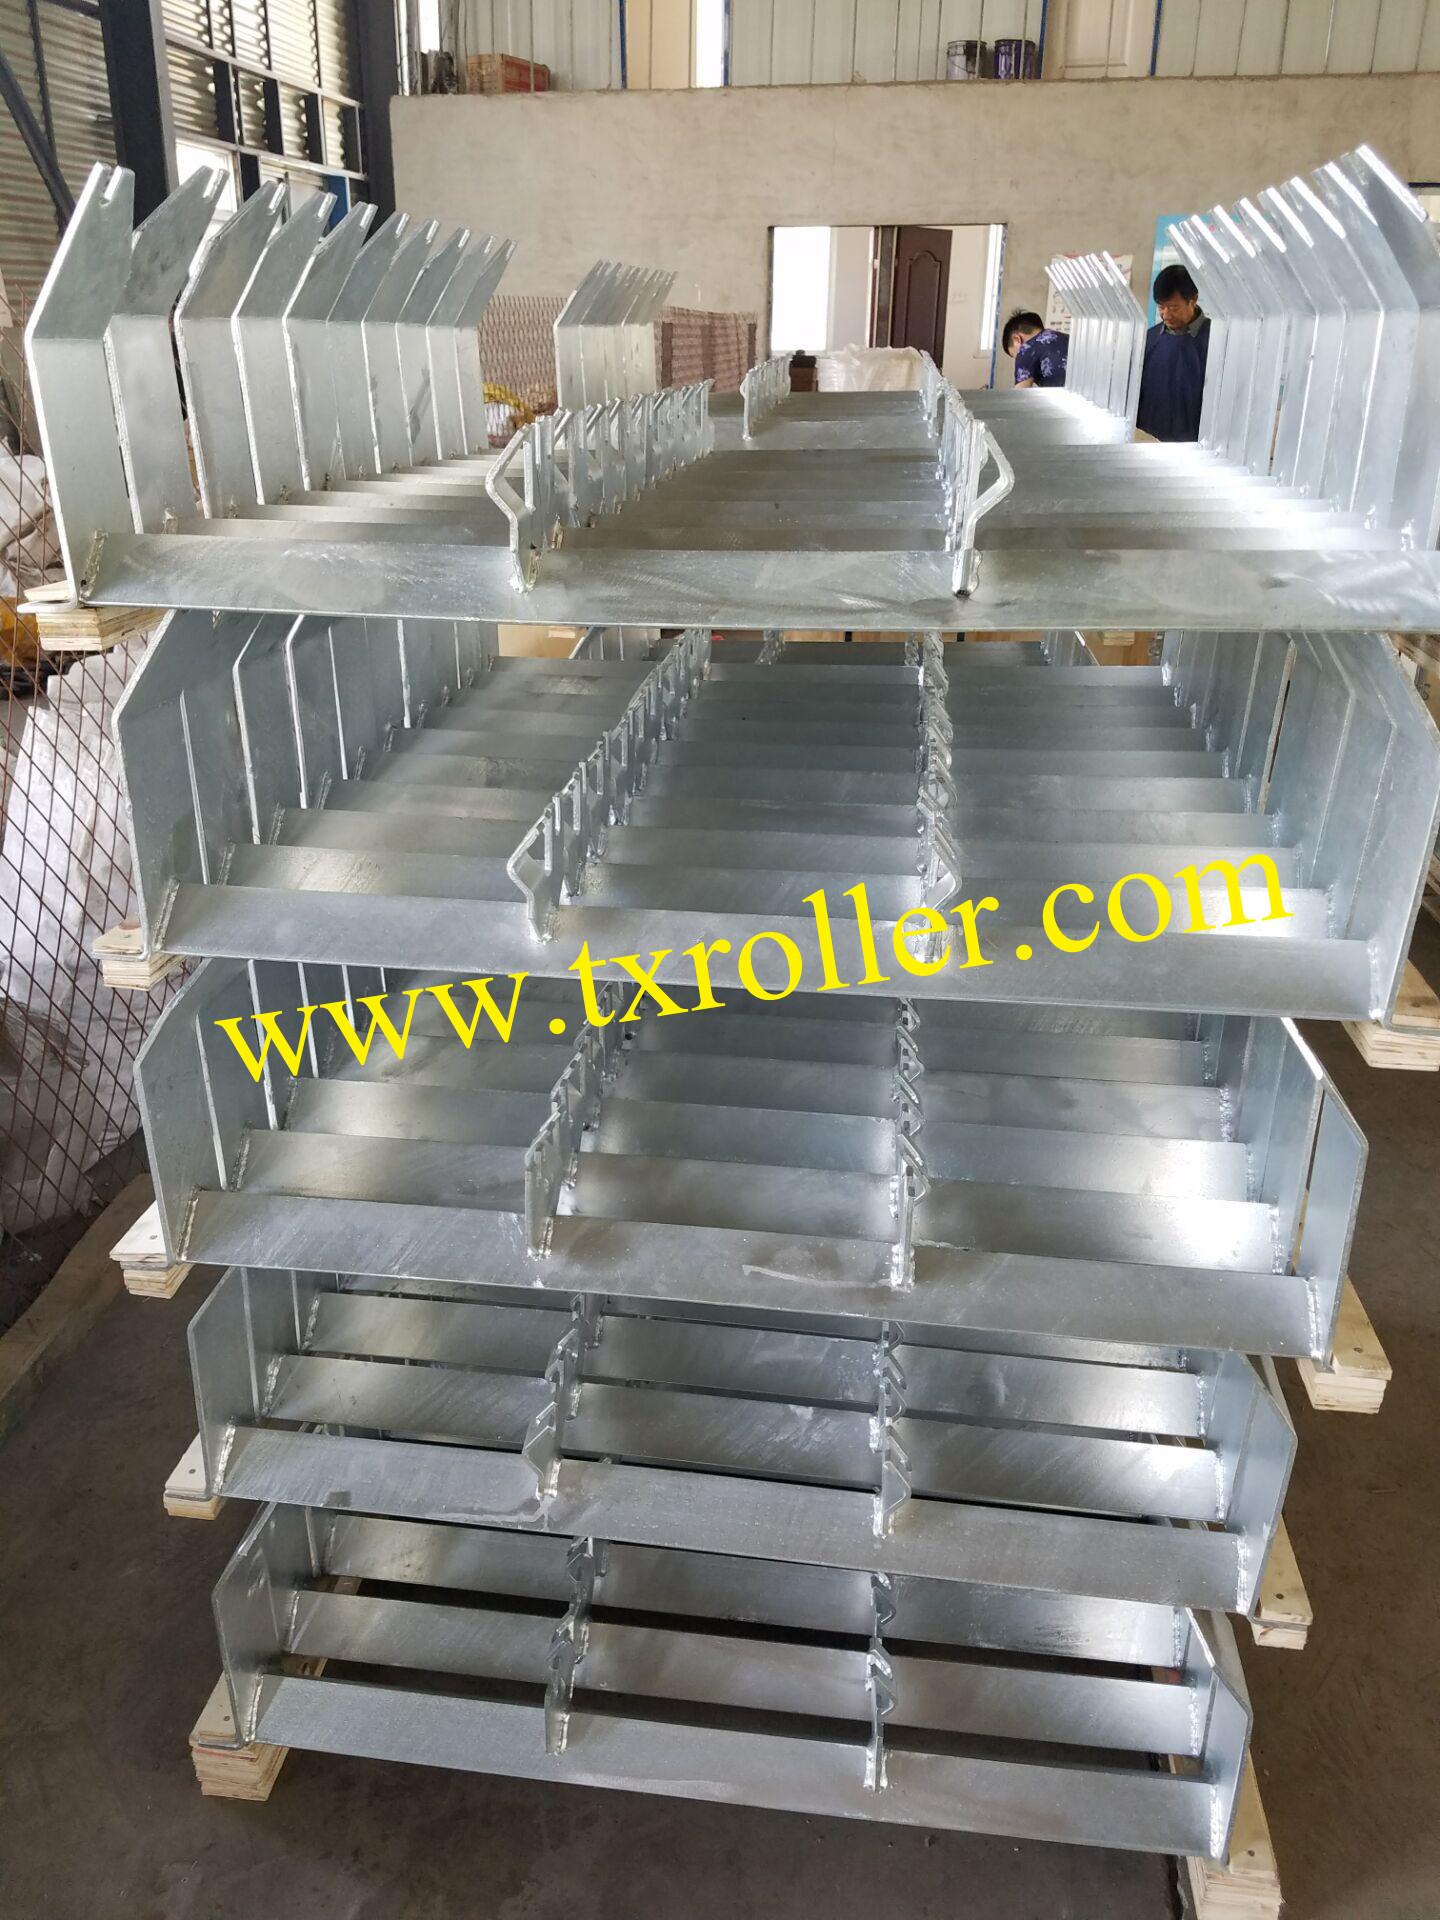 OEM offset inline troughed idler conveyor roller bracket for Material handling equipment parts heavy duty